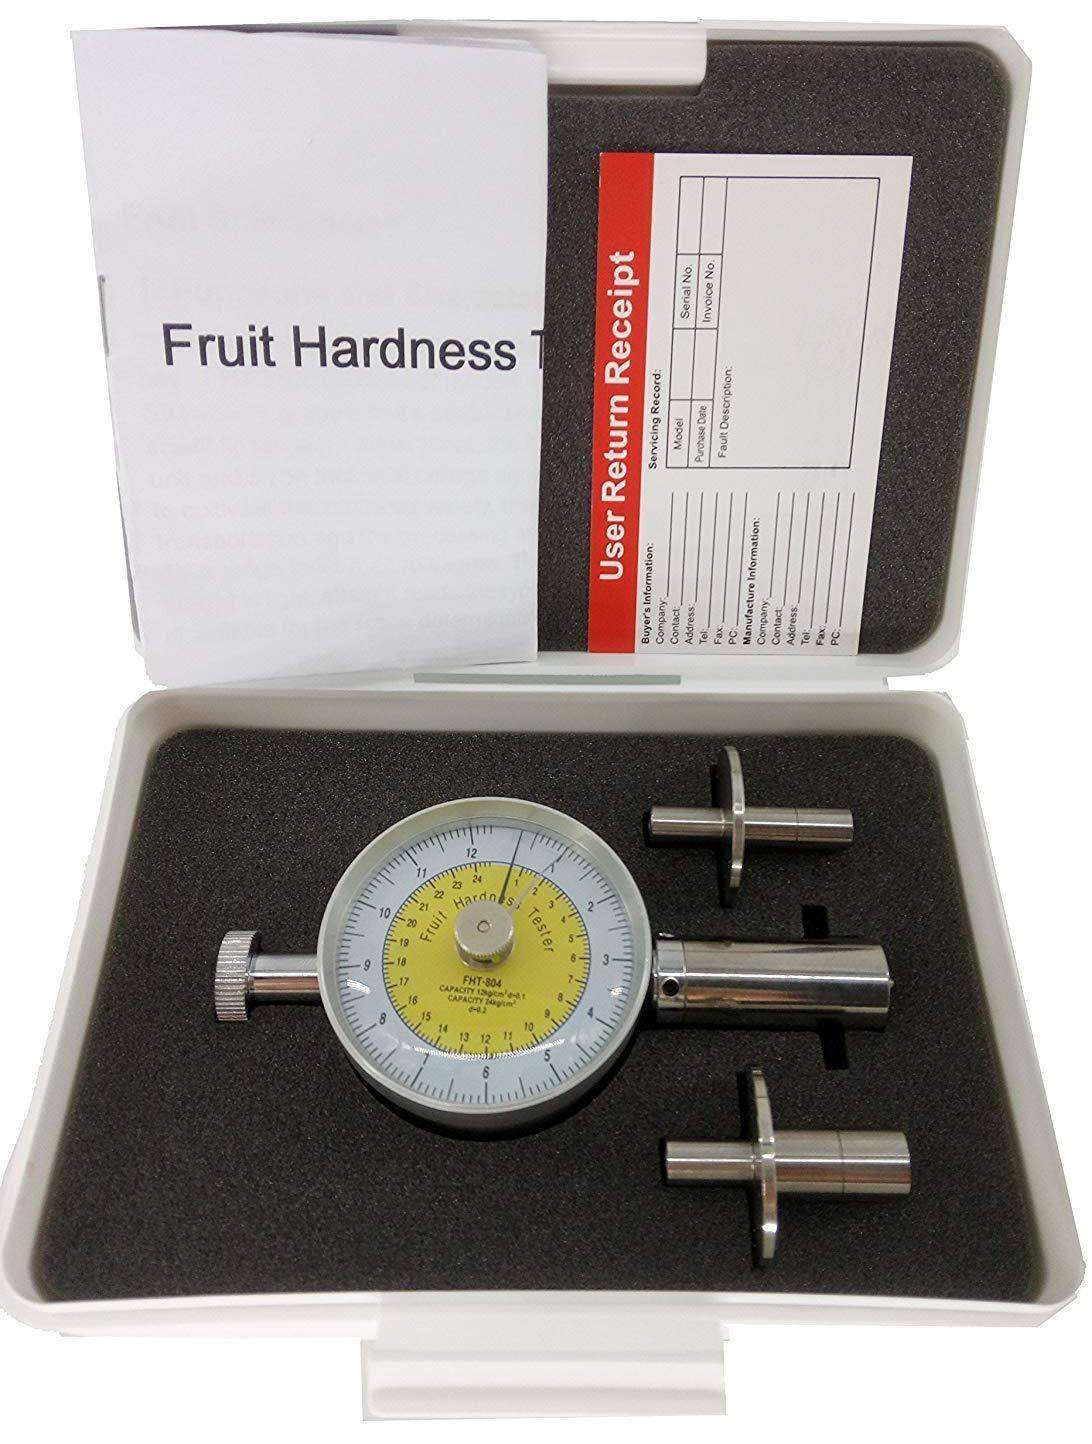 SR 11mm 0.5-24kg/cm2 SR VTSYIQI FHT-804 Fruit penetrometer Tester Fruit Sclerometer Fruit Hardness Tester Durometer Hardness Tester 8mm Fruit Durometer Pressure Head 0.5-12kg/cm2 ×105Pa ×105Pa